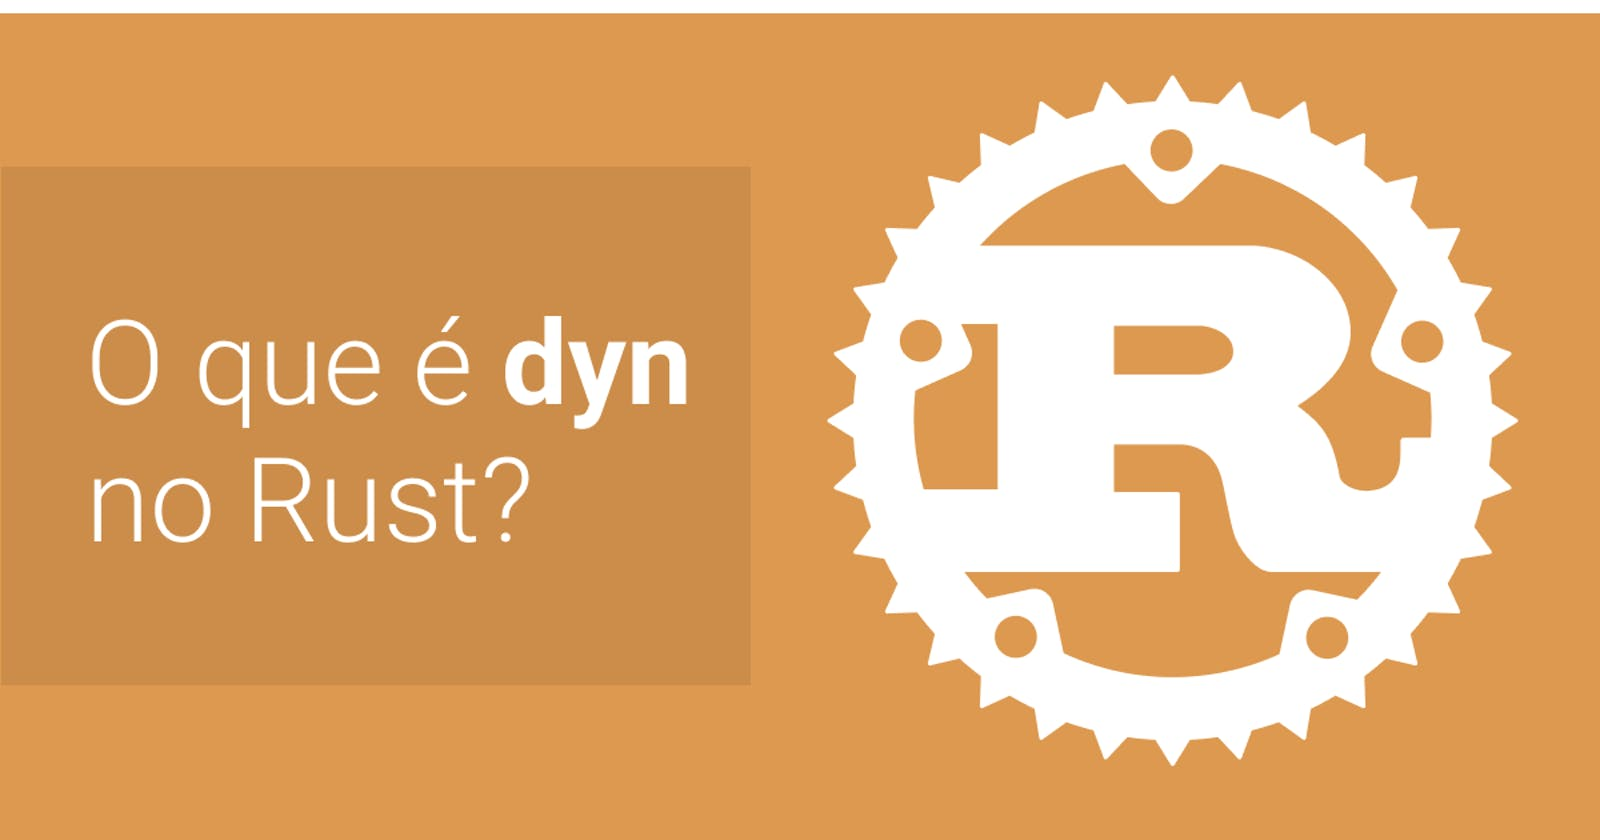 O que é dyn no Rust?